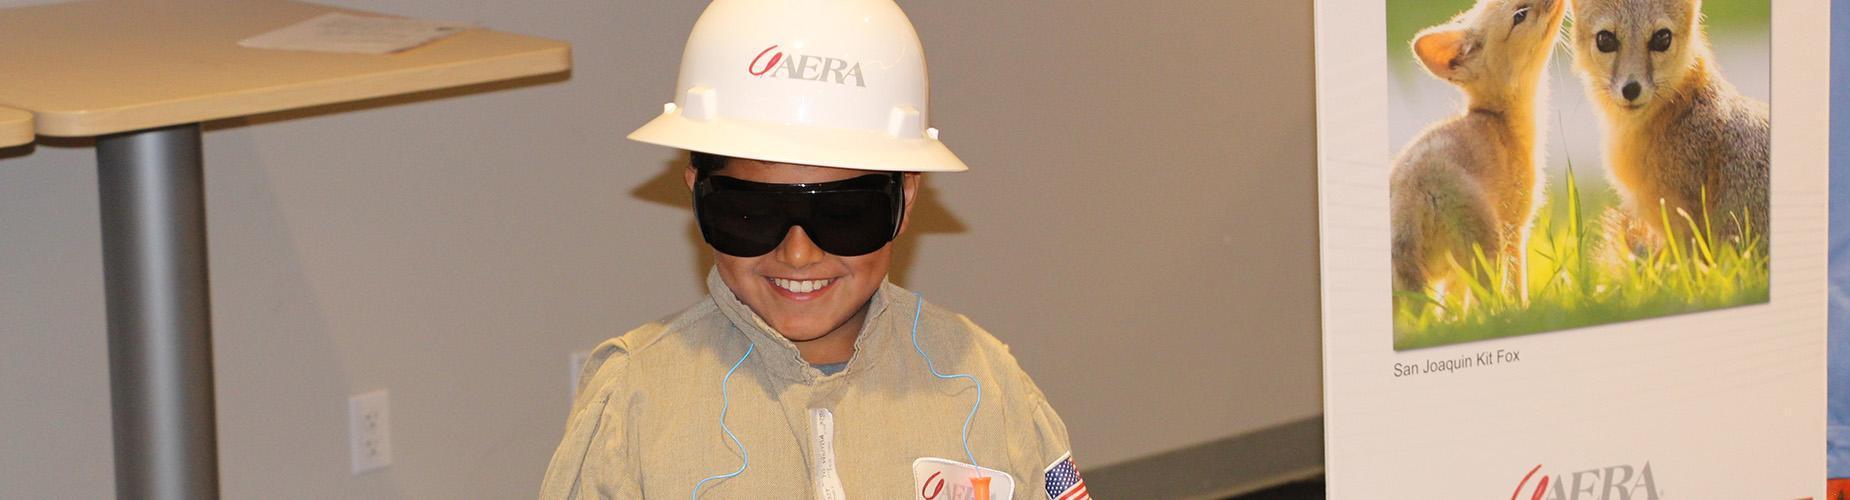 Child wearing a hard hat